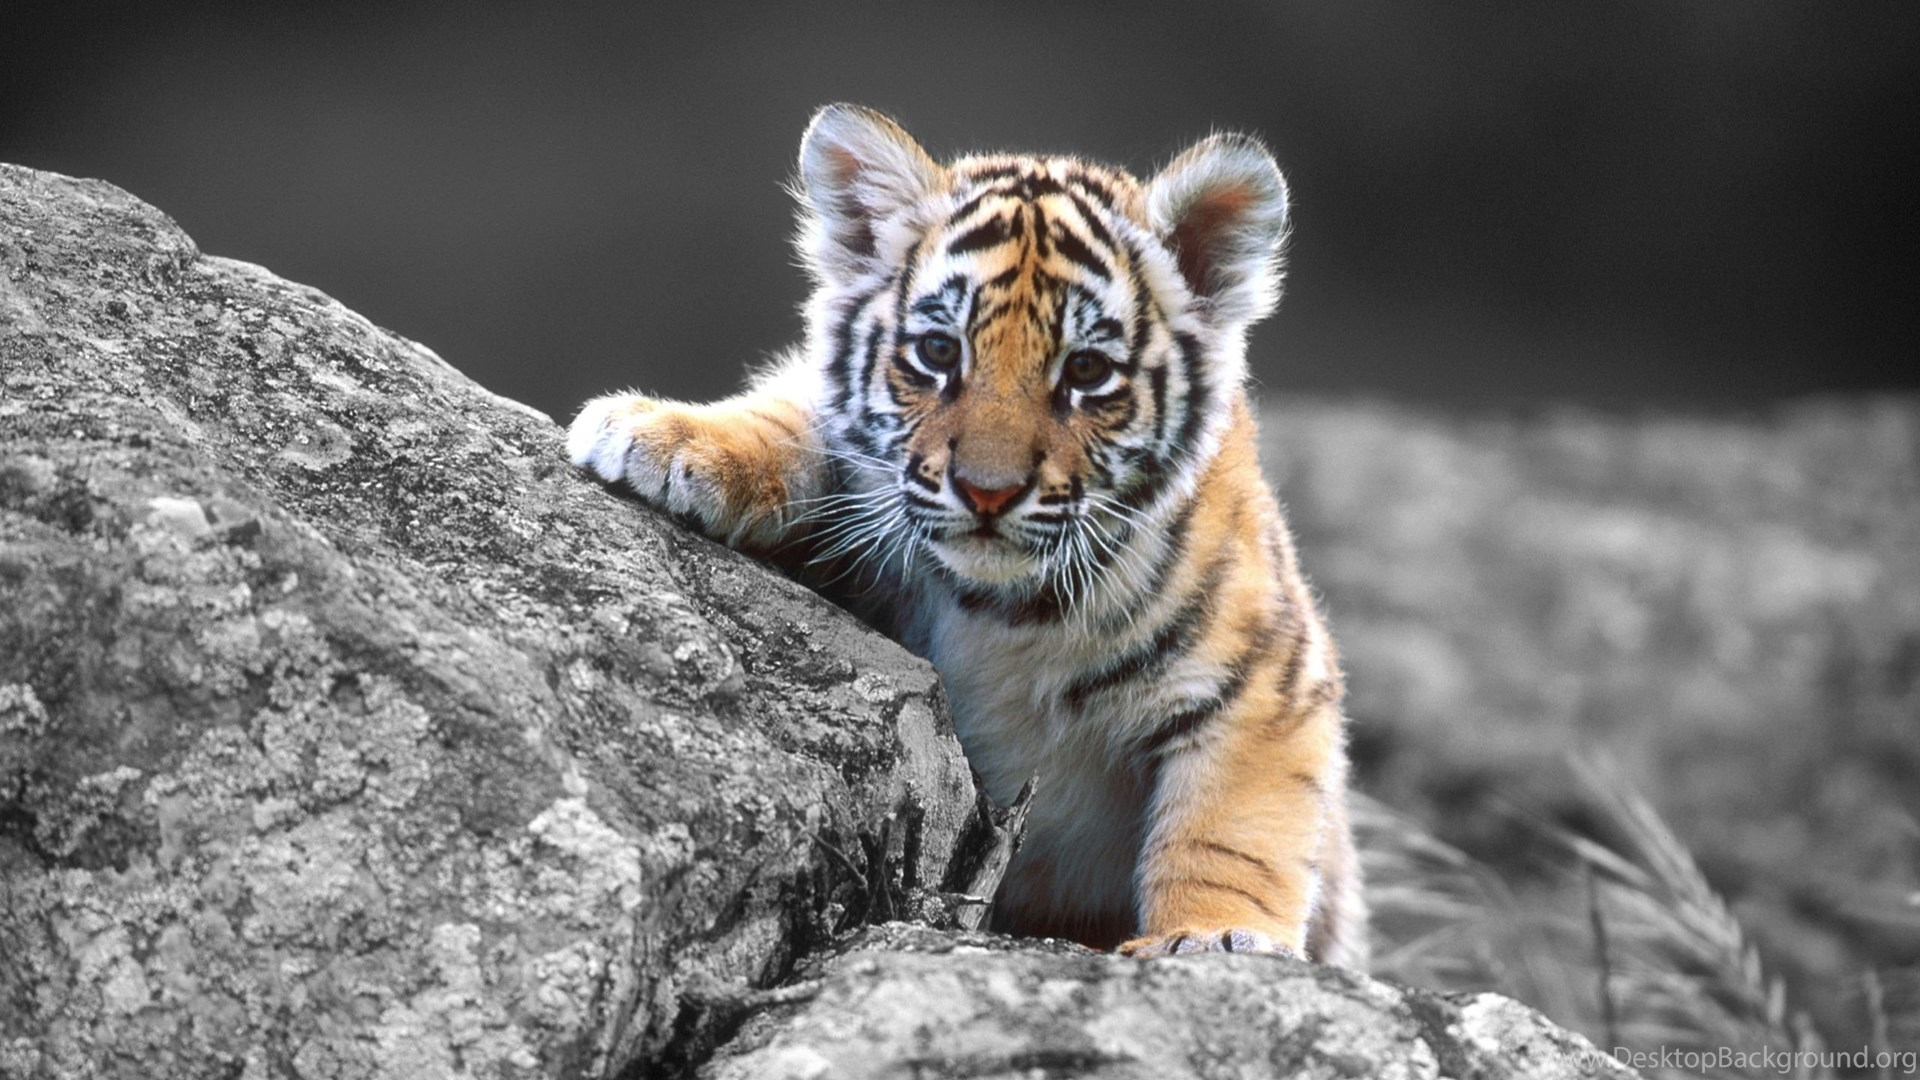 baby tiger wallpapers desktop desktop background